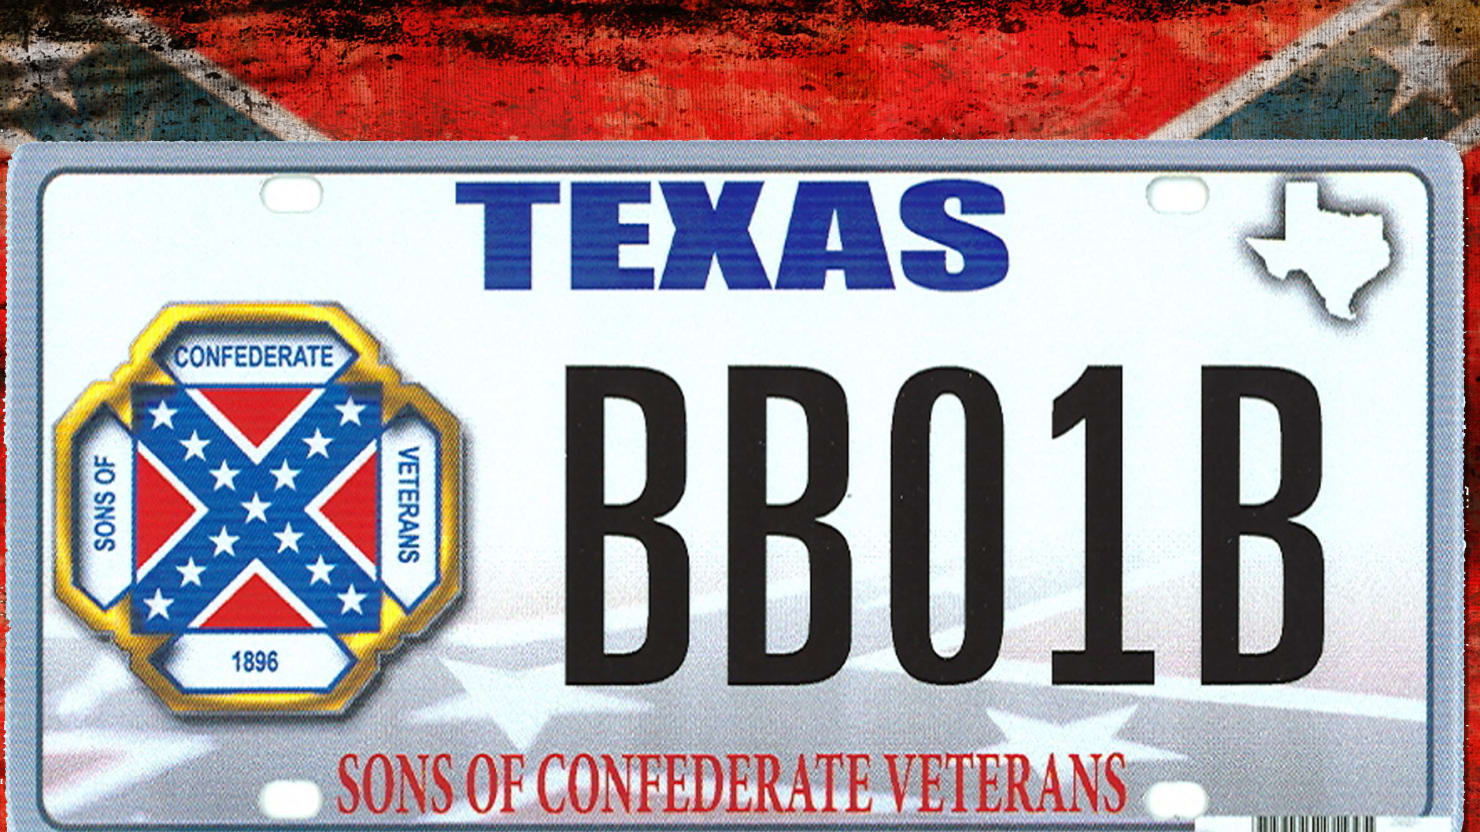 In Defense of Confederate License Plates